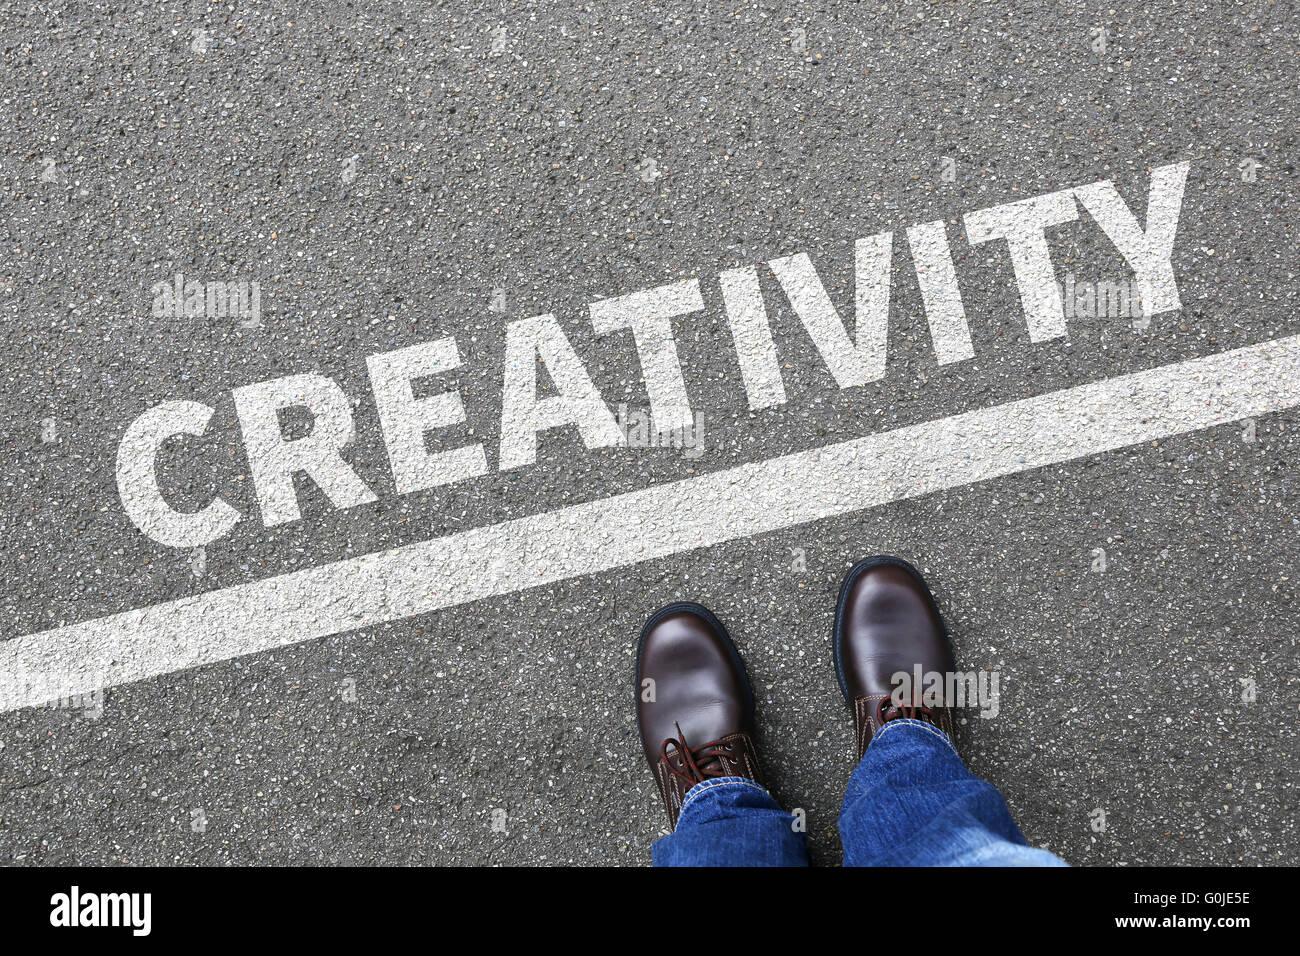 Creativity creative imagine imagination thinking ideas success successful businessman business concept inspiration - Stock Image